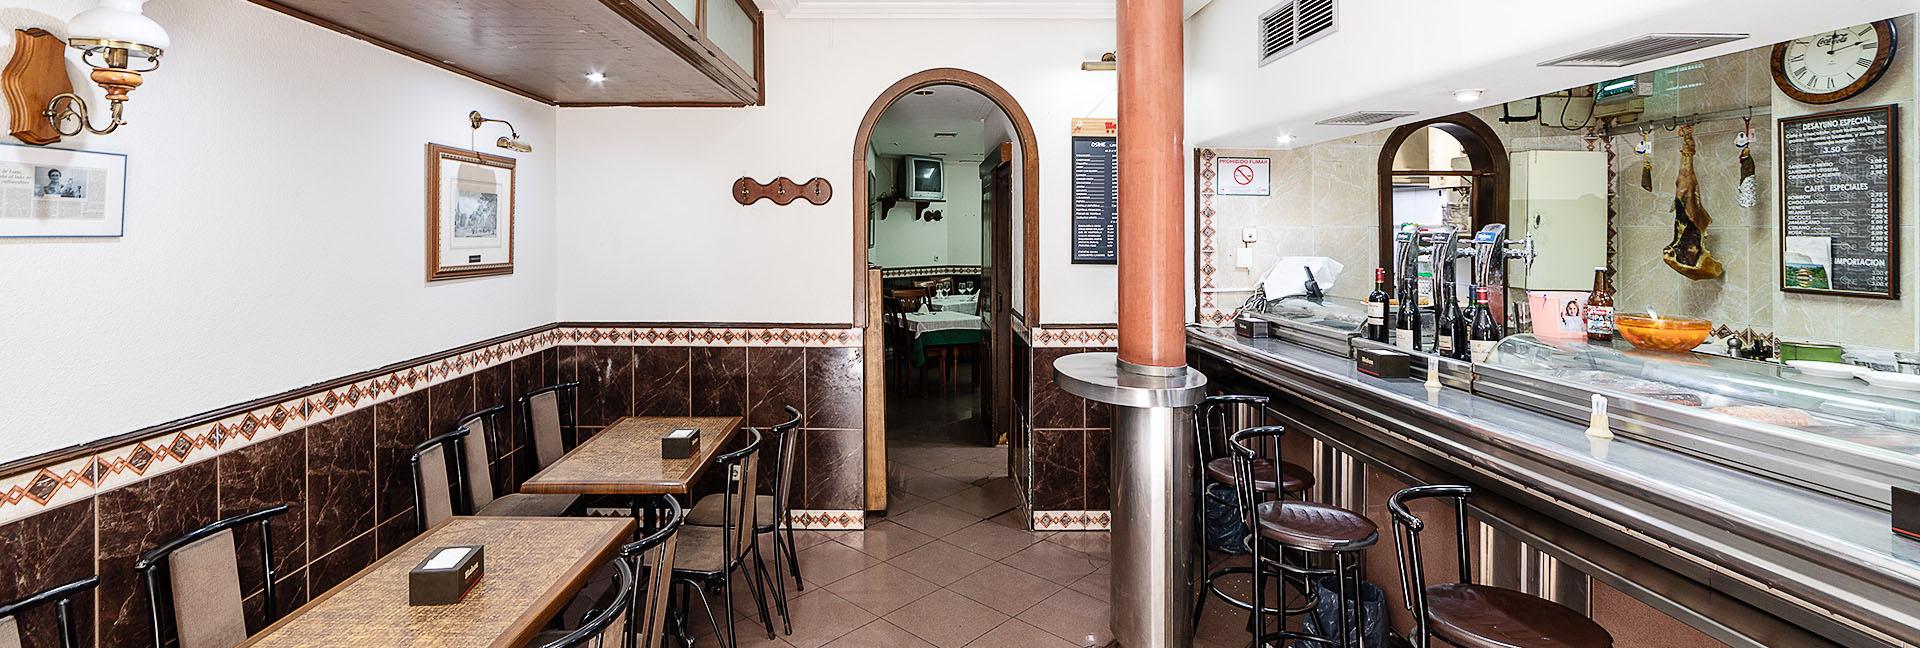 Osine Bar